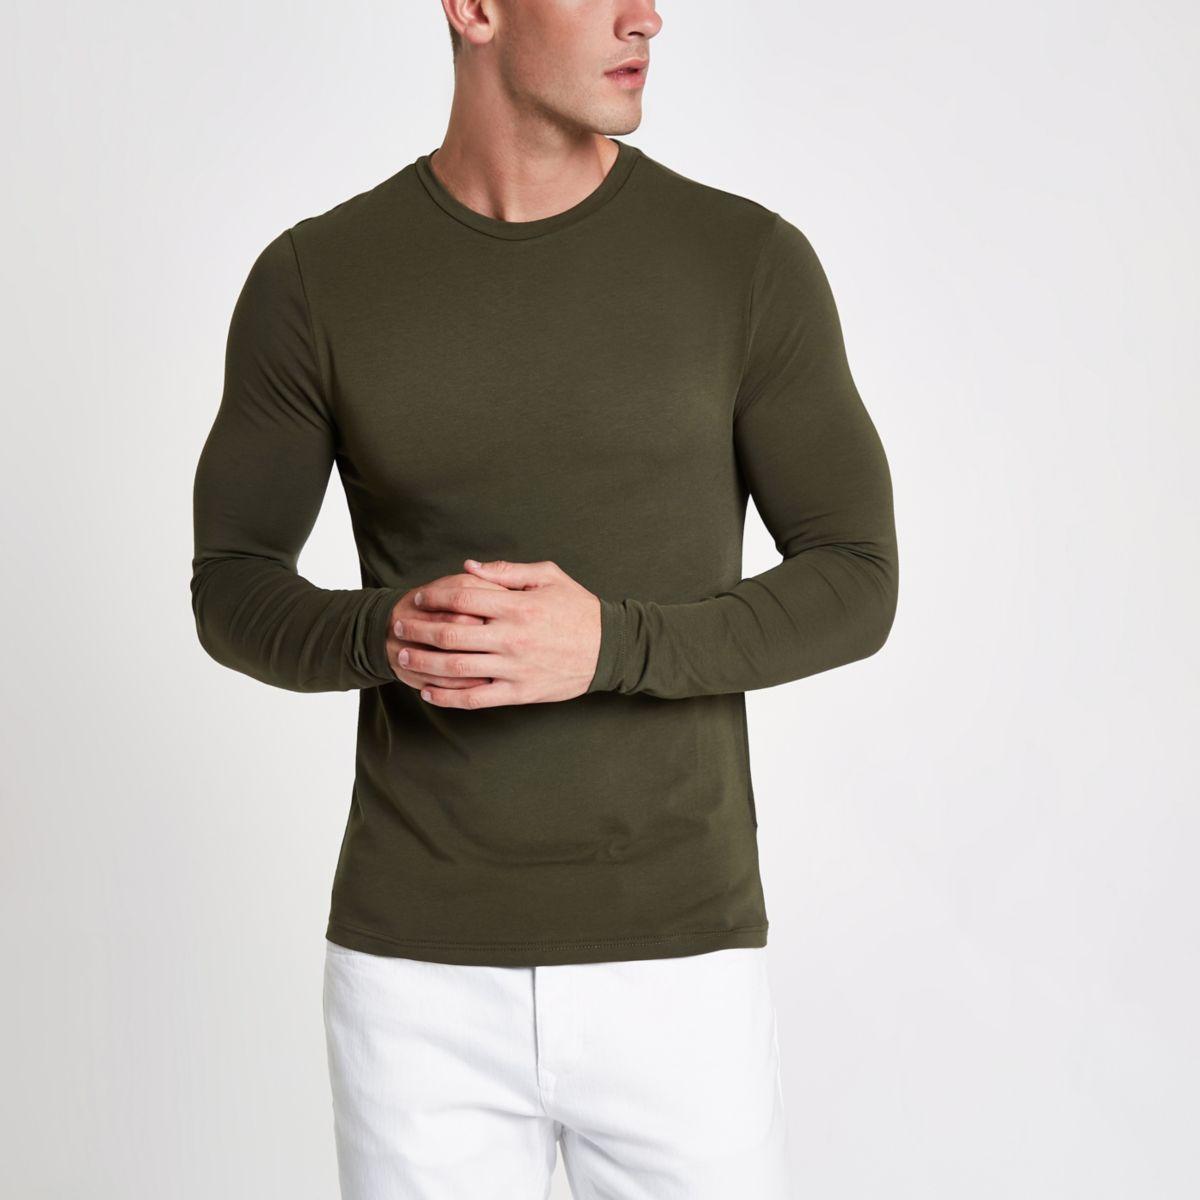 Khaki muscle fit long sleeve T-shirt